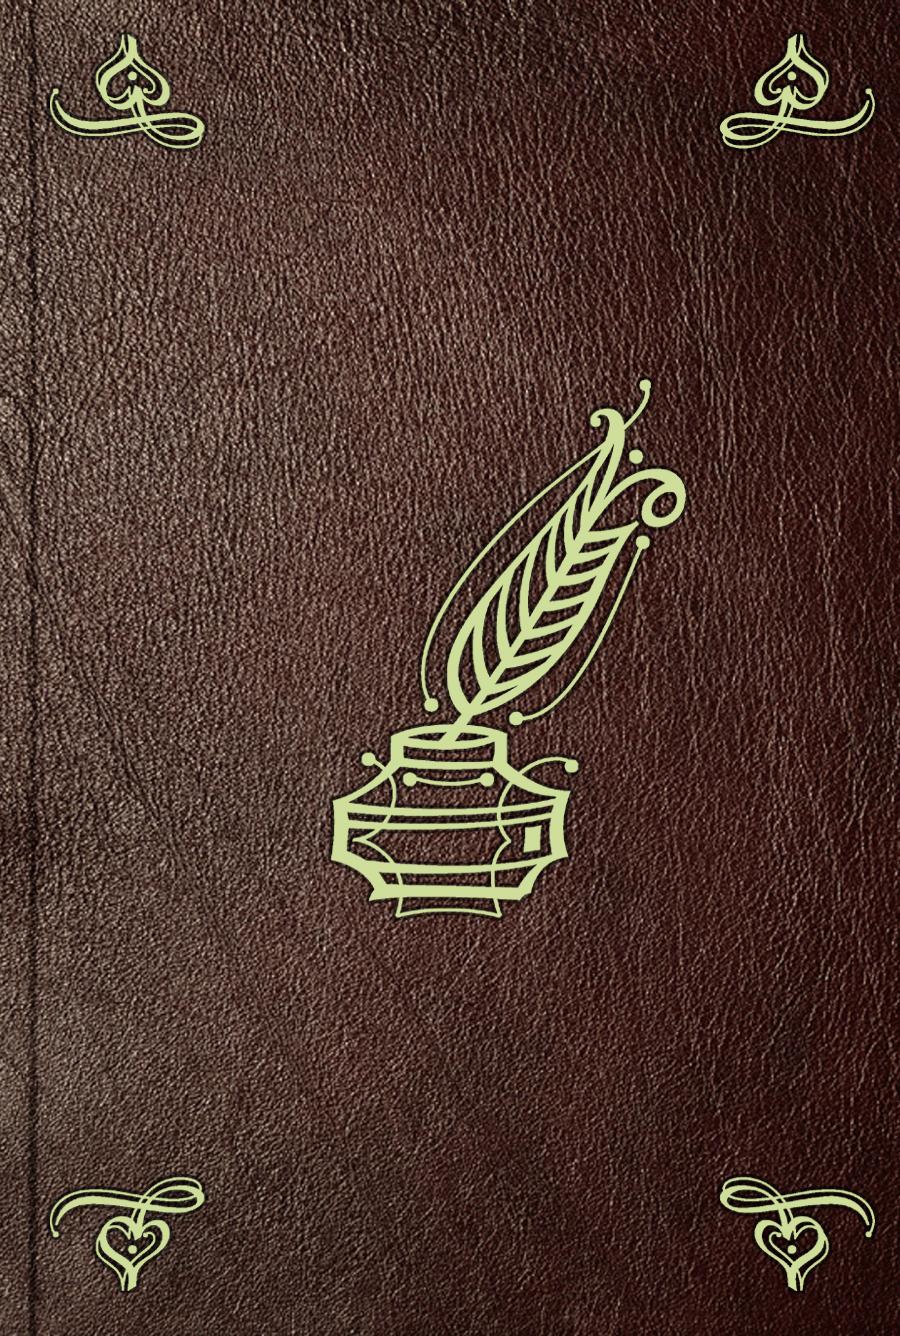 Gotthold Ephraim Lessing Sämmtliche Schriften. T. 15 johann jakob engel j j engel s schriften bd 10 philosophische schriften t 2